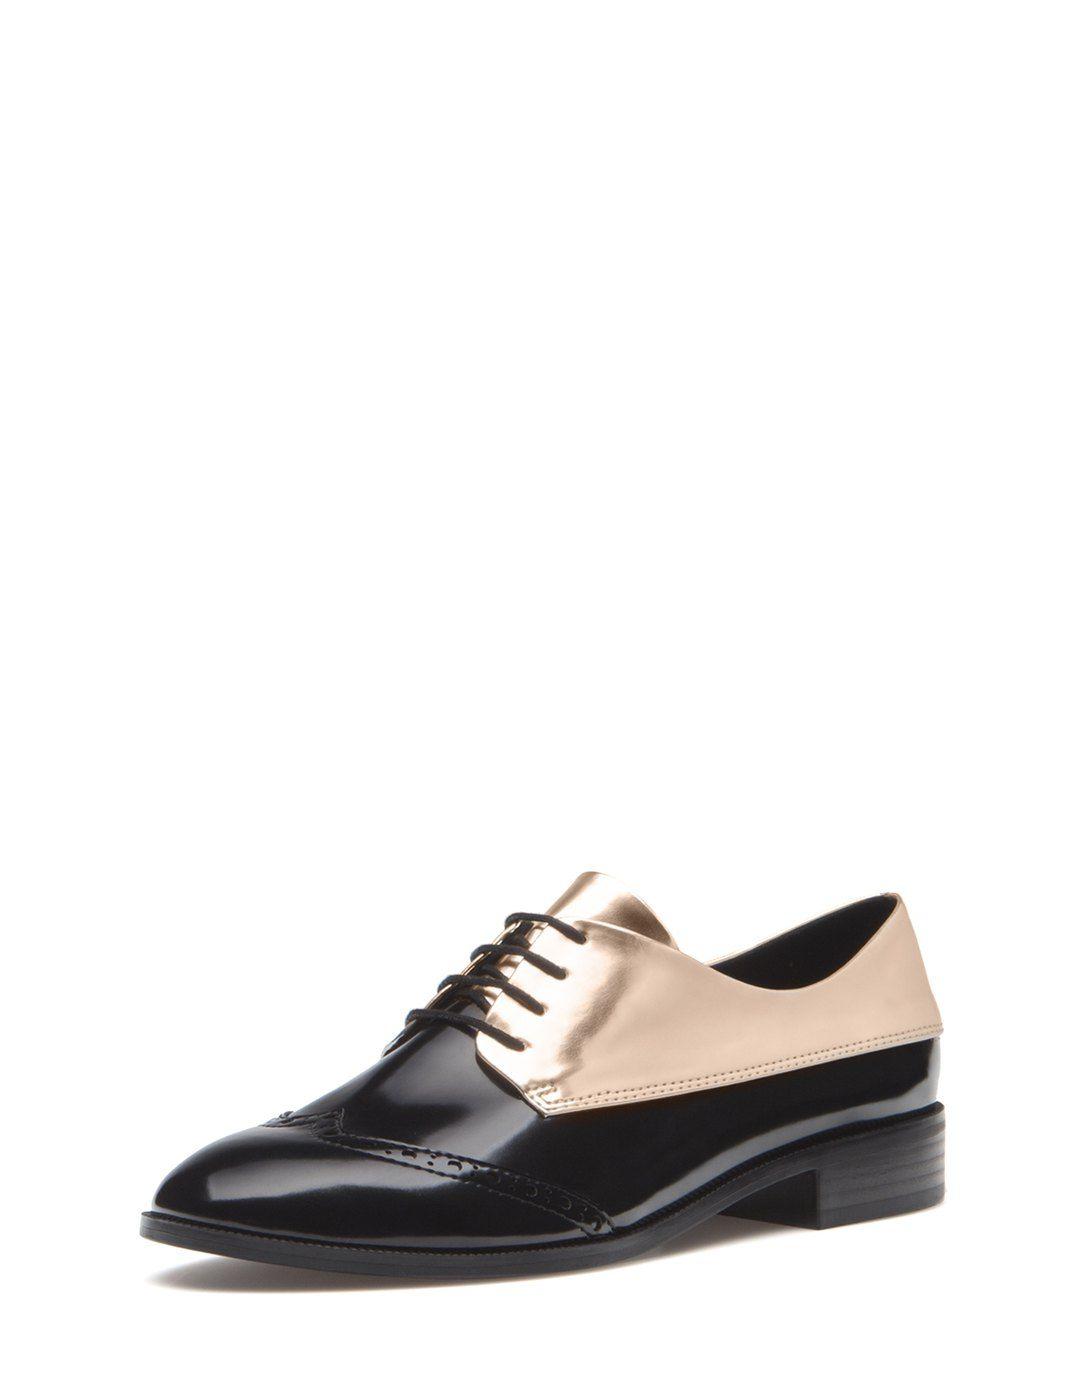 Metaliczne Oksfordy Dodatki Dla Pan Stradivarius Polska Dress Shoes Men Oxford Shoes Stradivarius